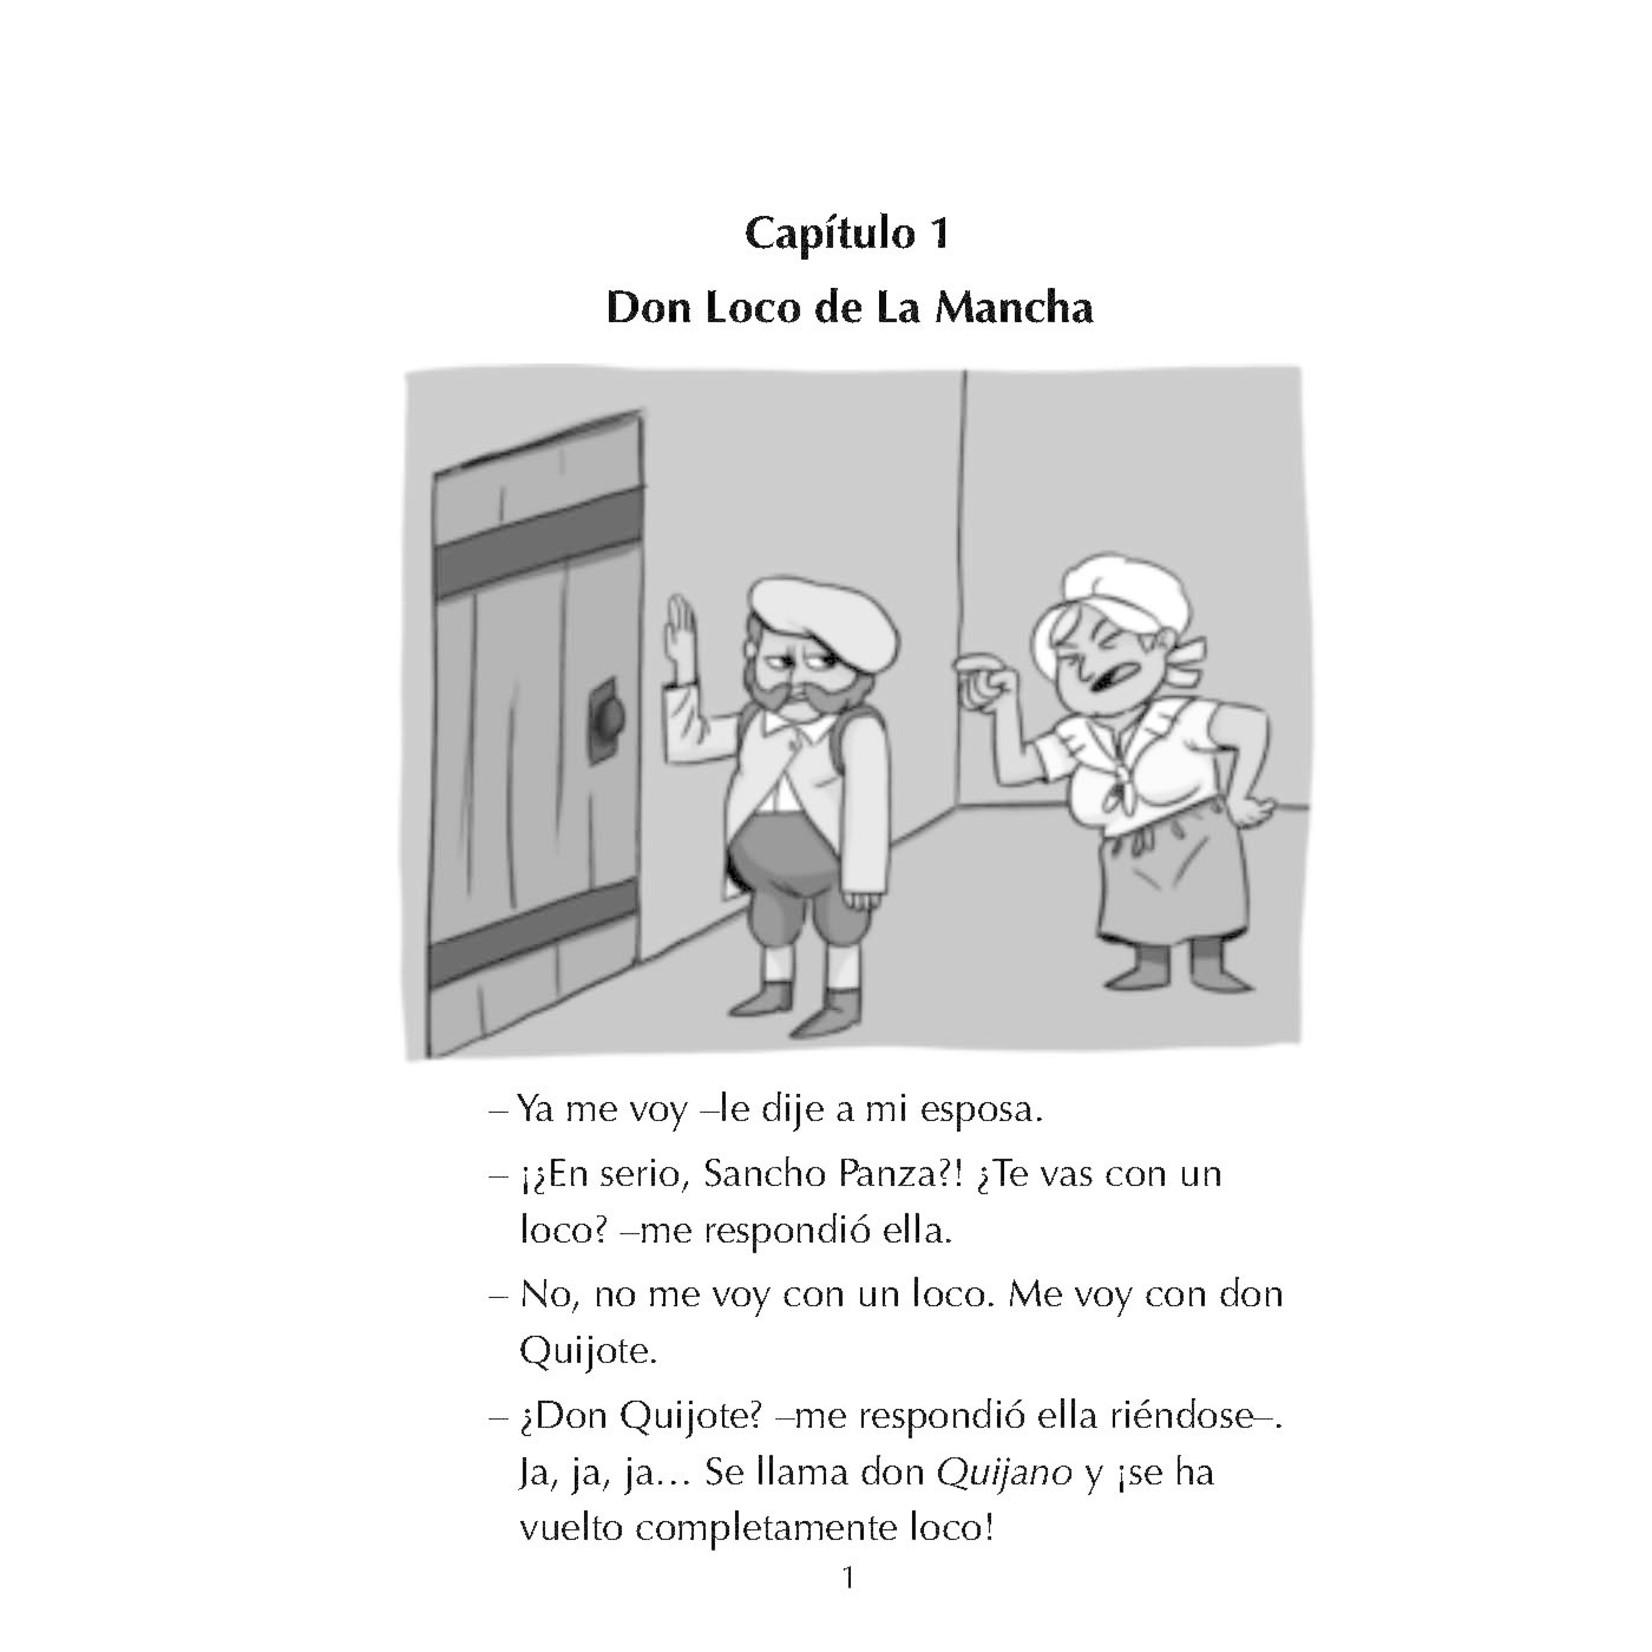 Fluency Matters Las aventuras de Don Quijote de la Mancha